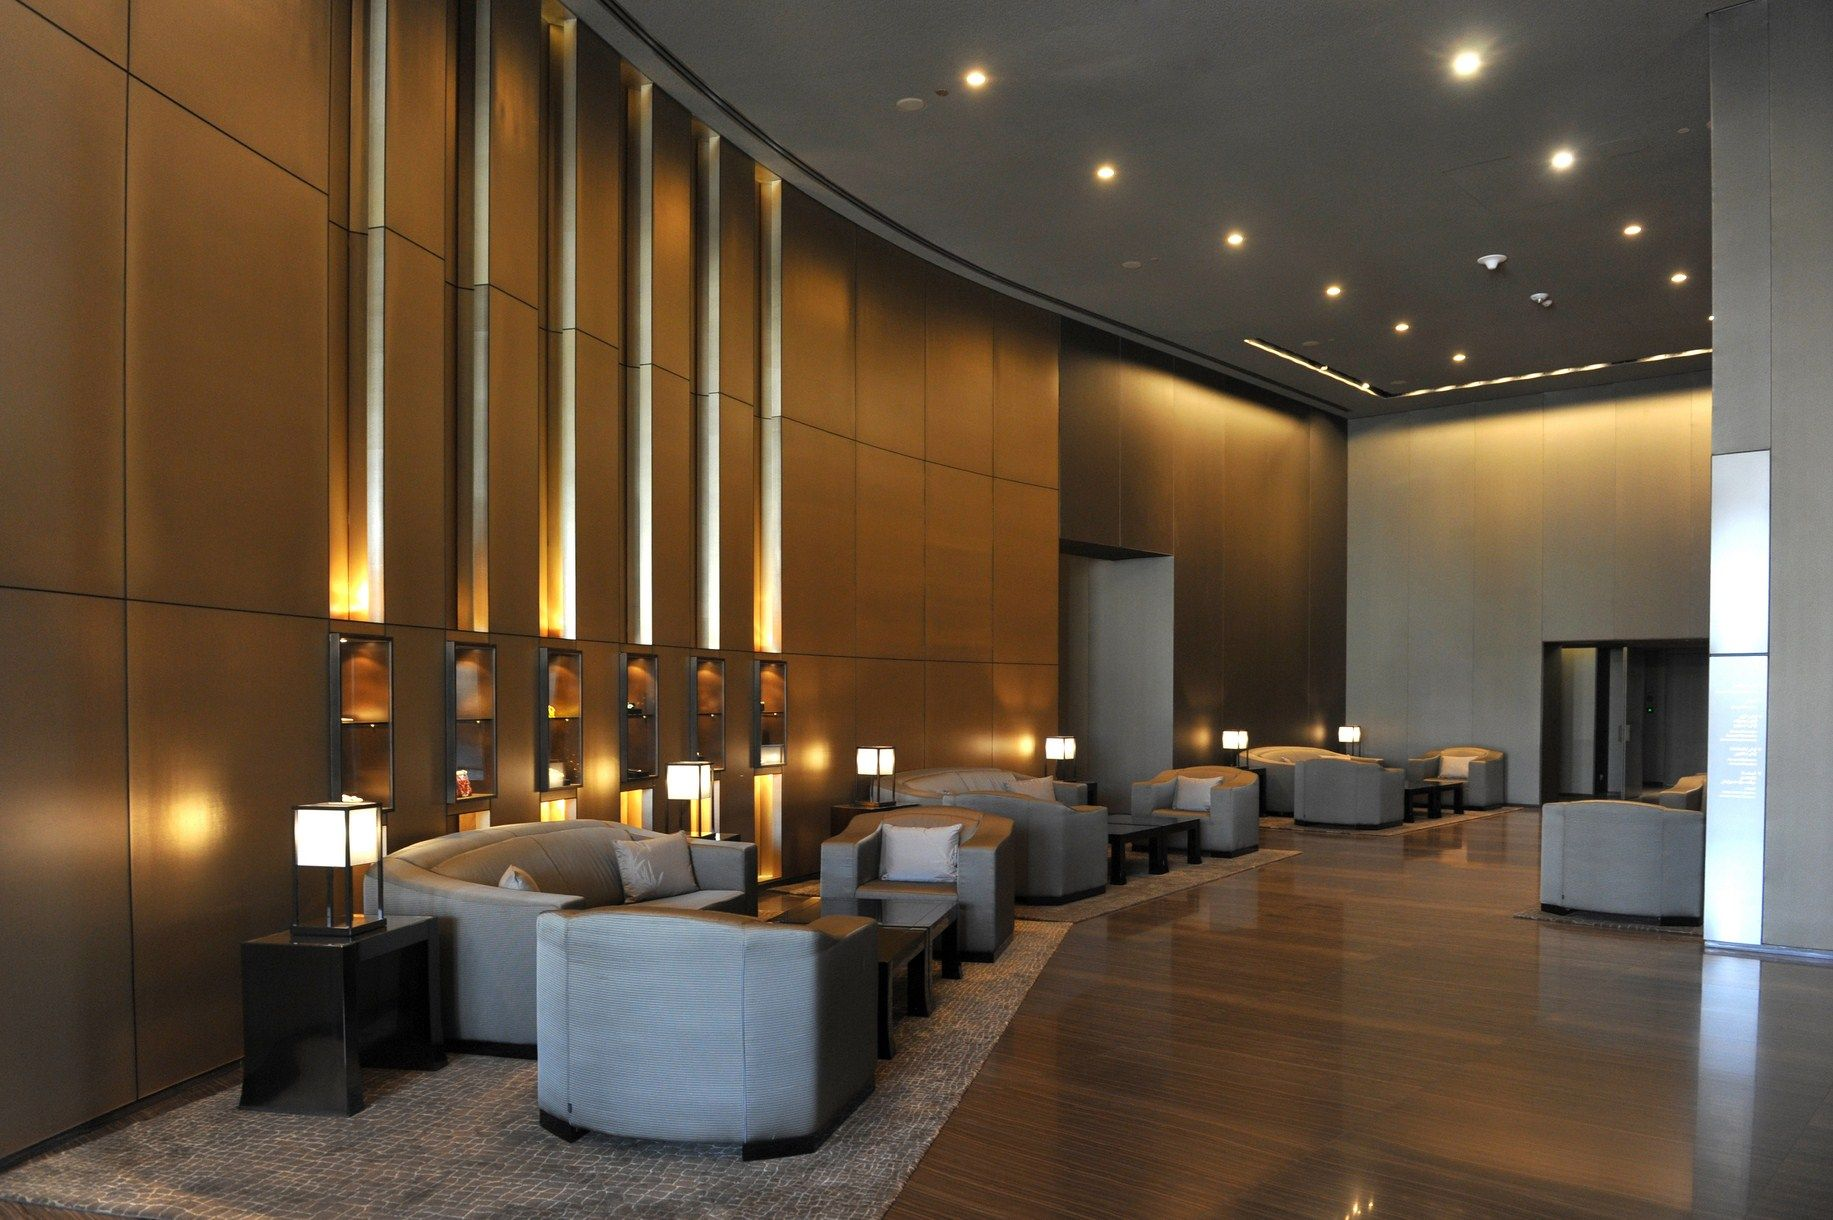 Armani Hotel Dubai Lobby